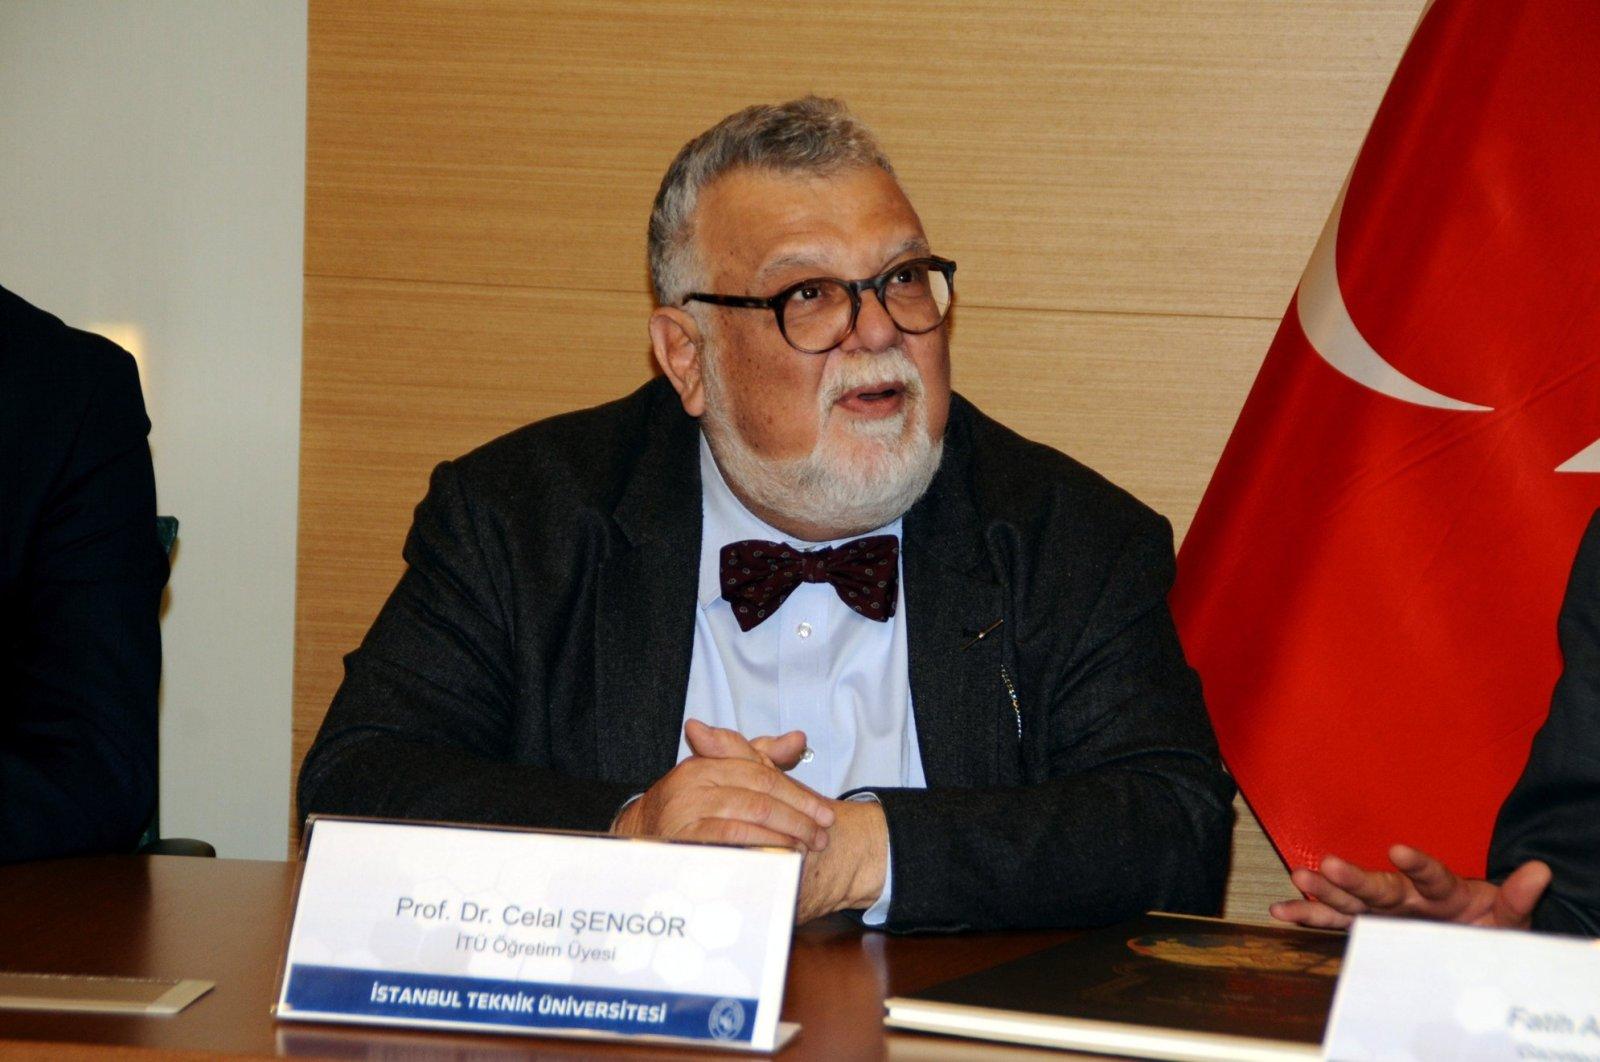 Professor Celal Şengör speaks at an event at Istanbul Technical University (İTÜ), in Istanbul, Turkey, Jan. 3, 2018. (PHOTO BY MUSTAFA KAYA)